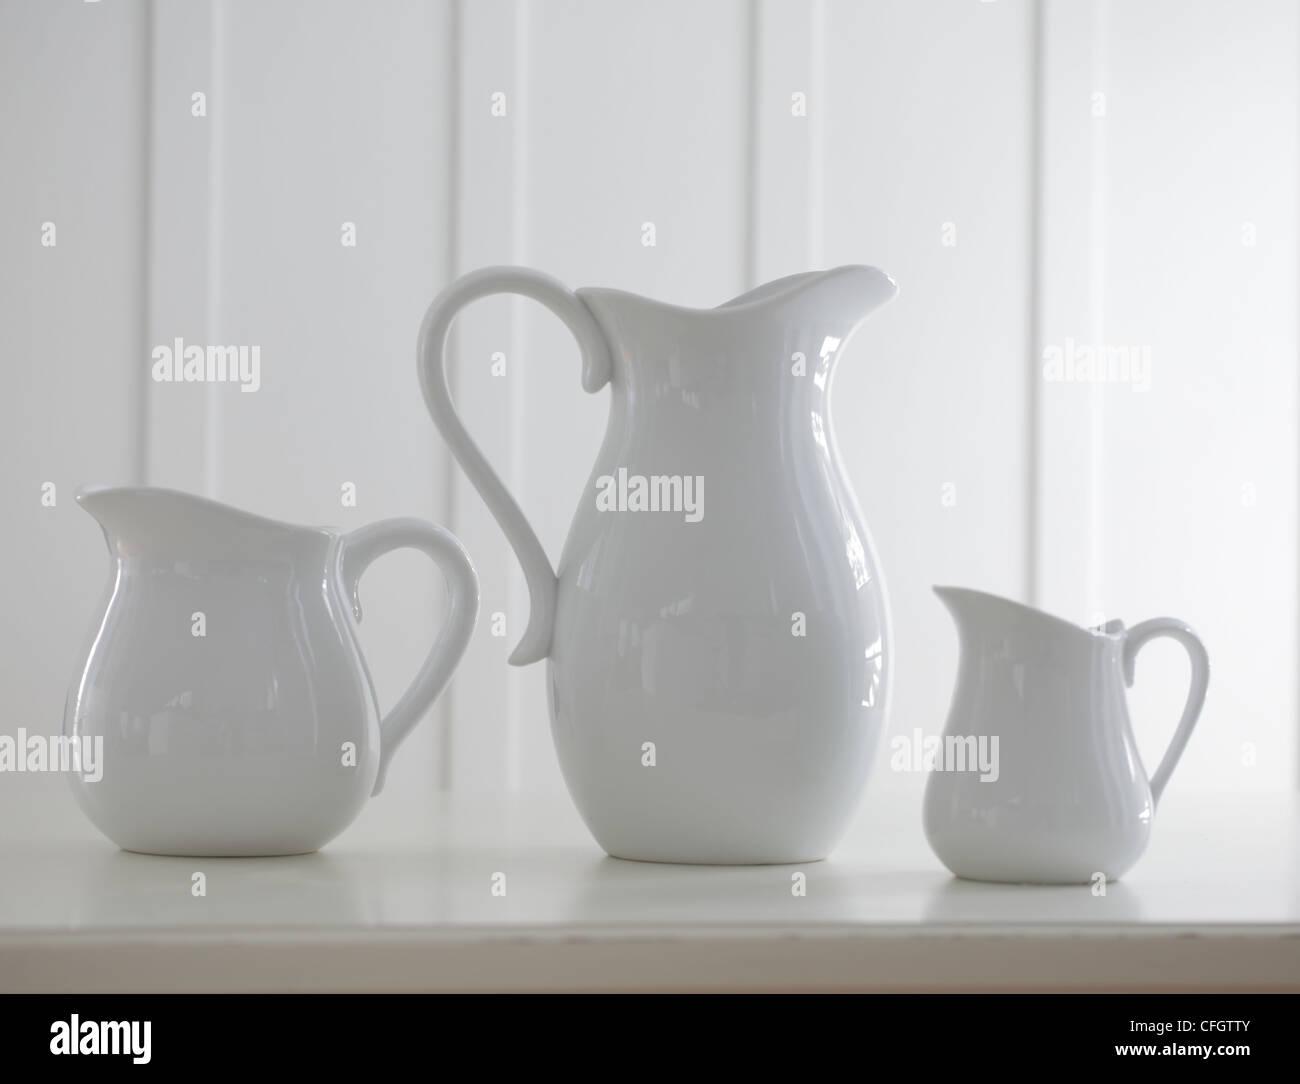 Three Porcelain Vases - Stock Image